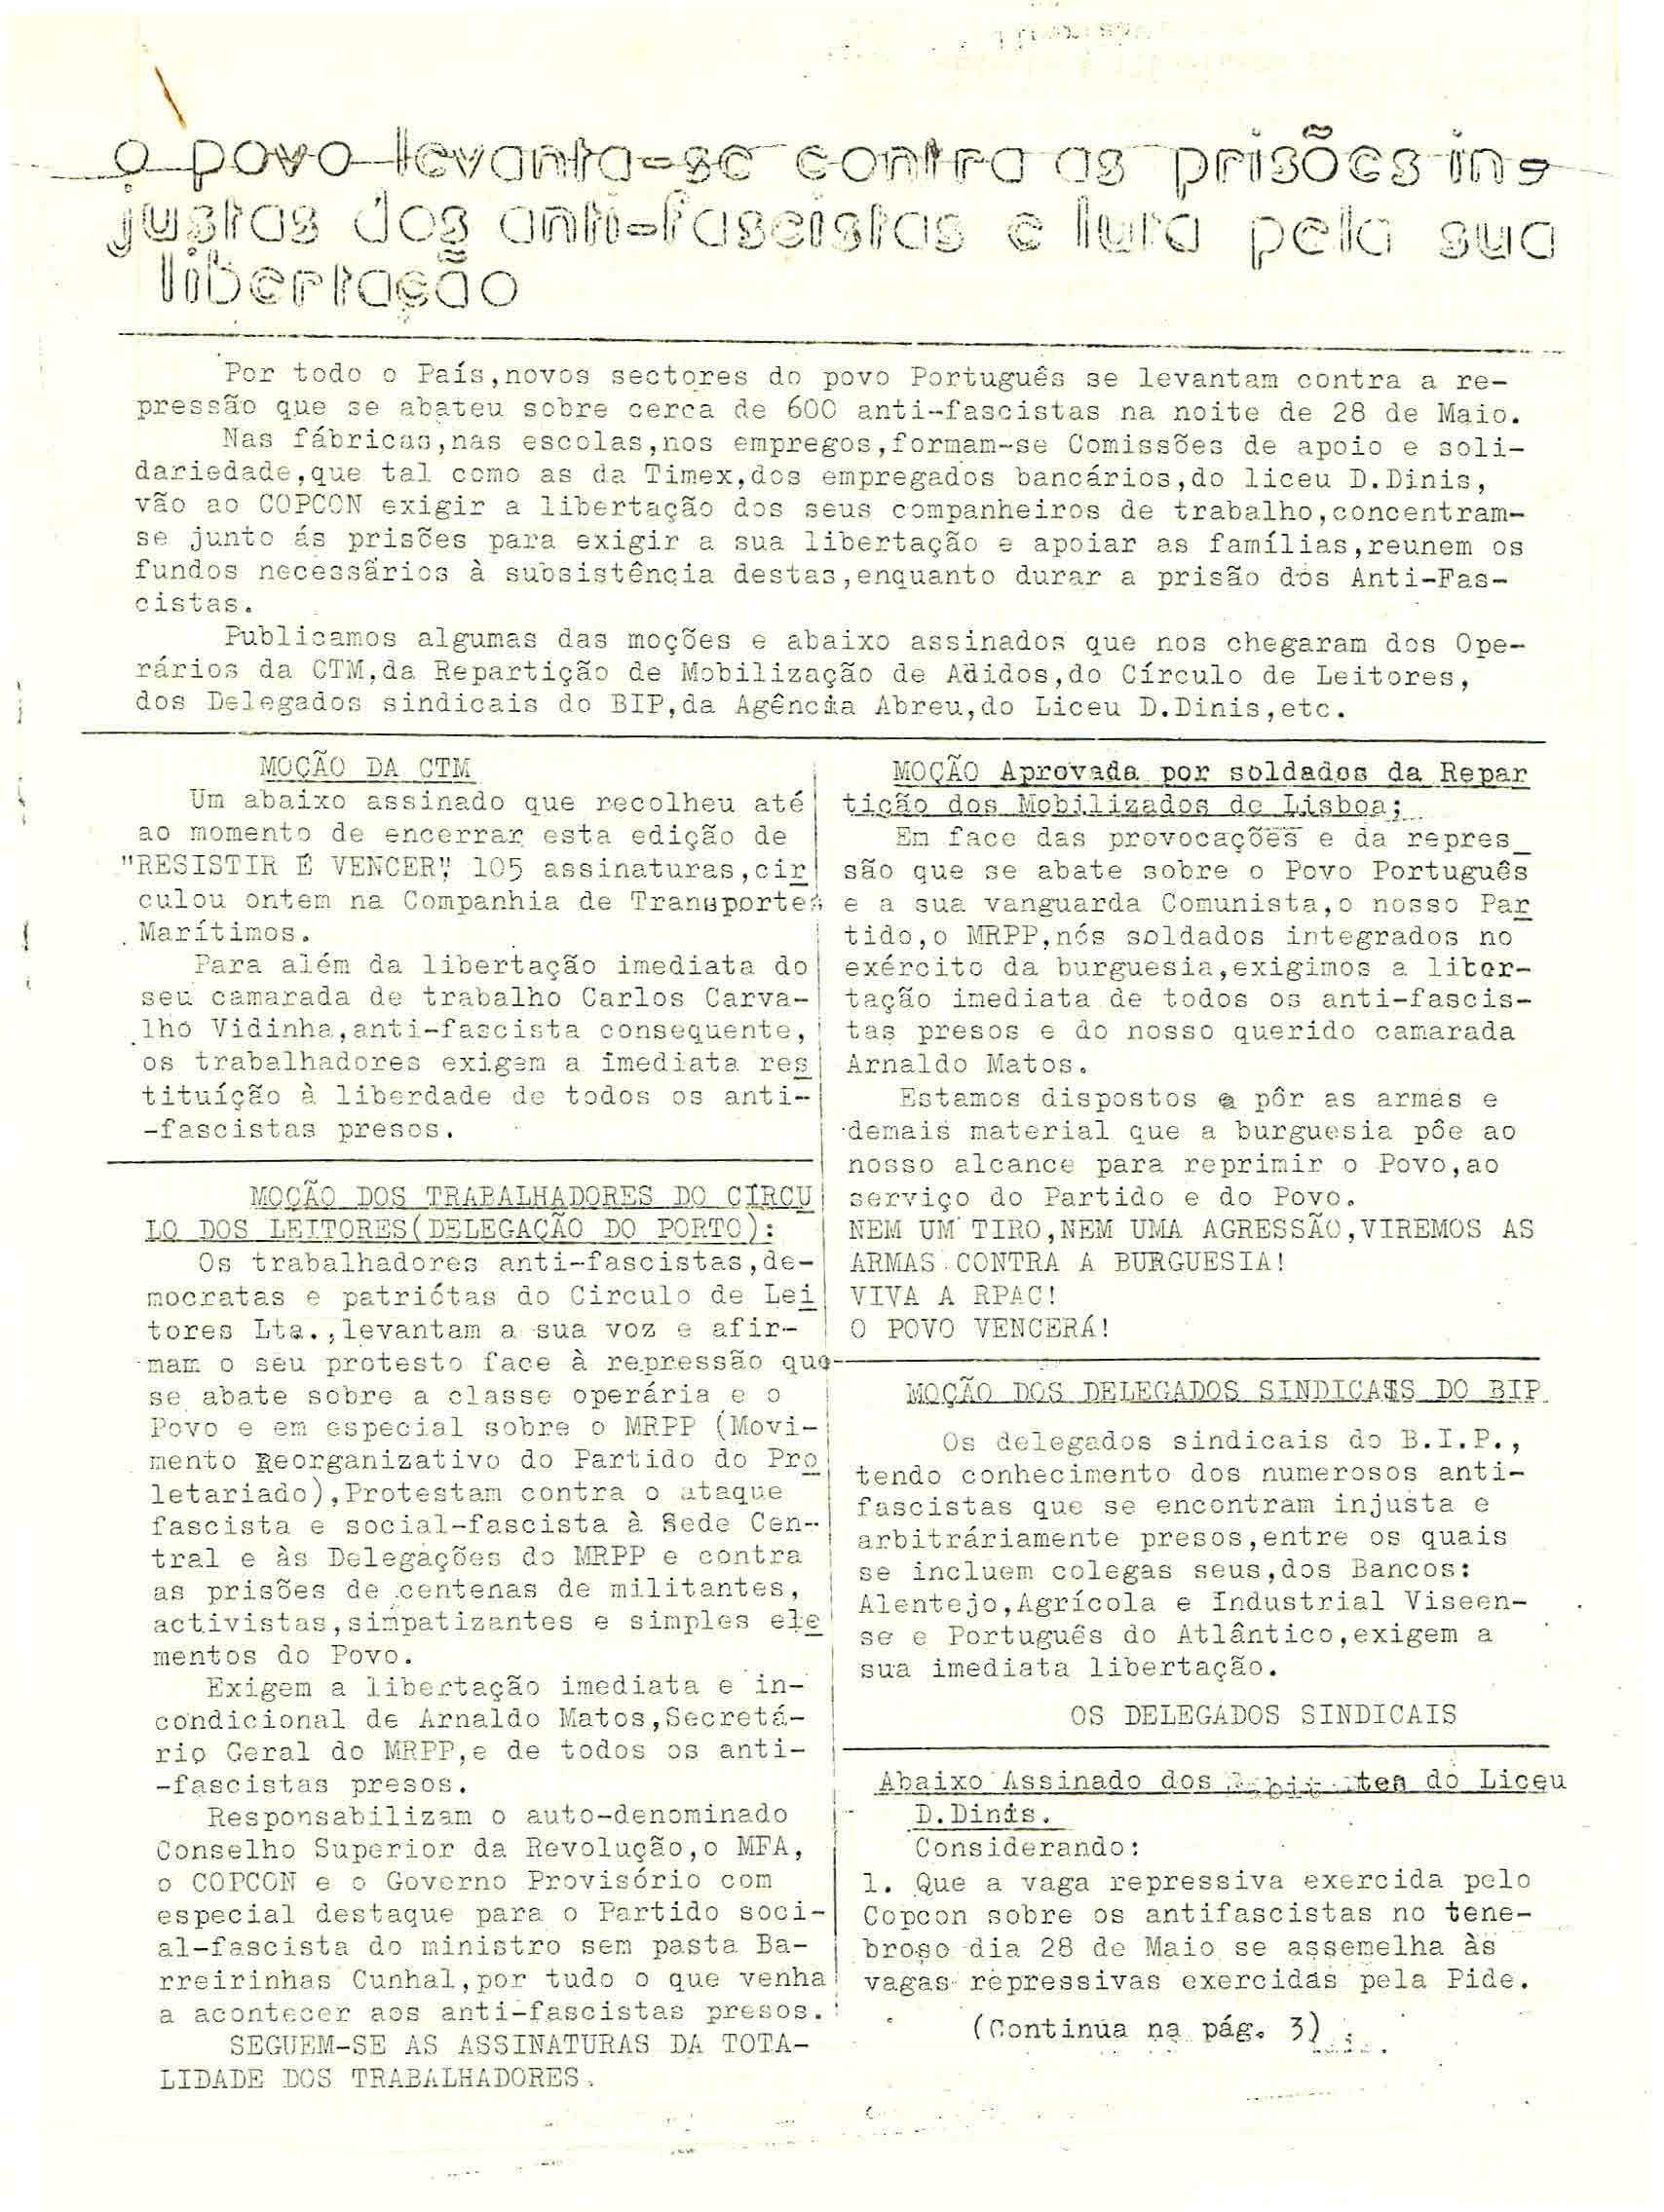 Copy of 25-09-11 (10) (6)